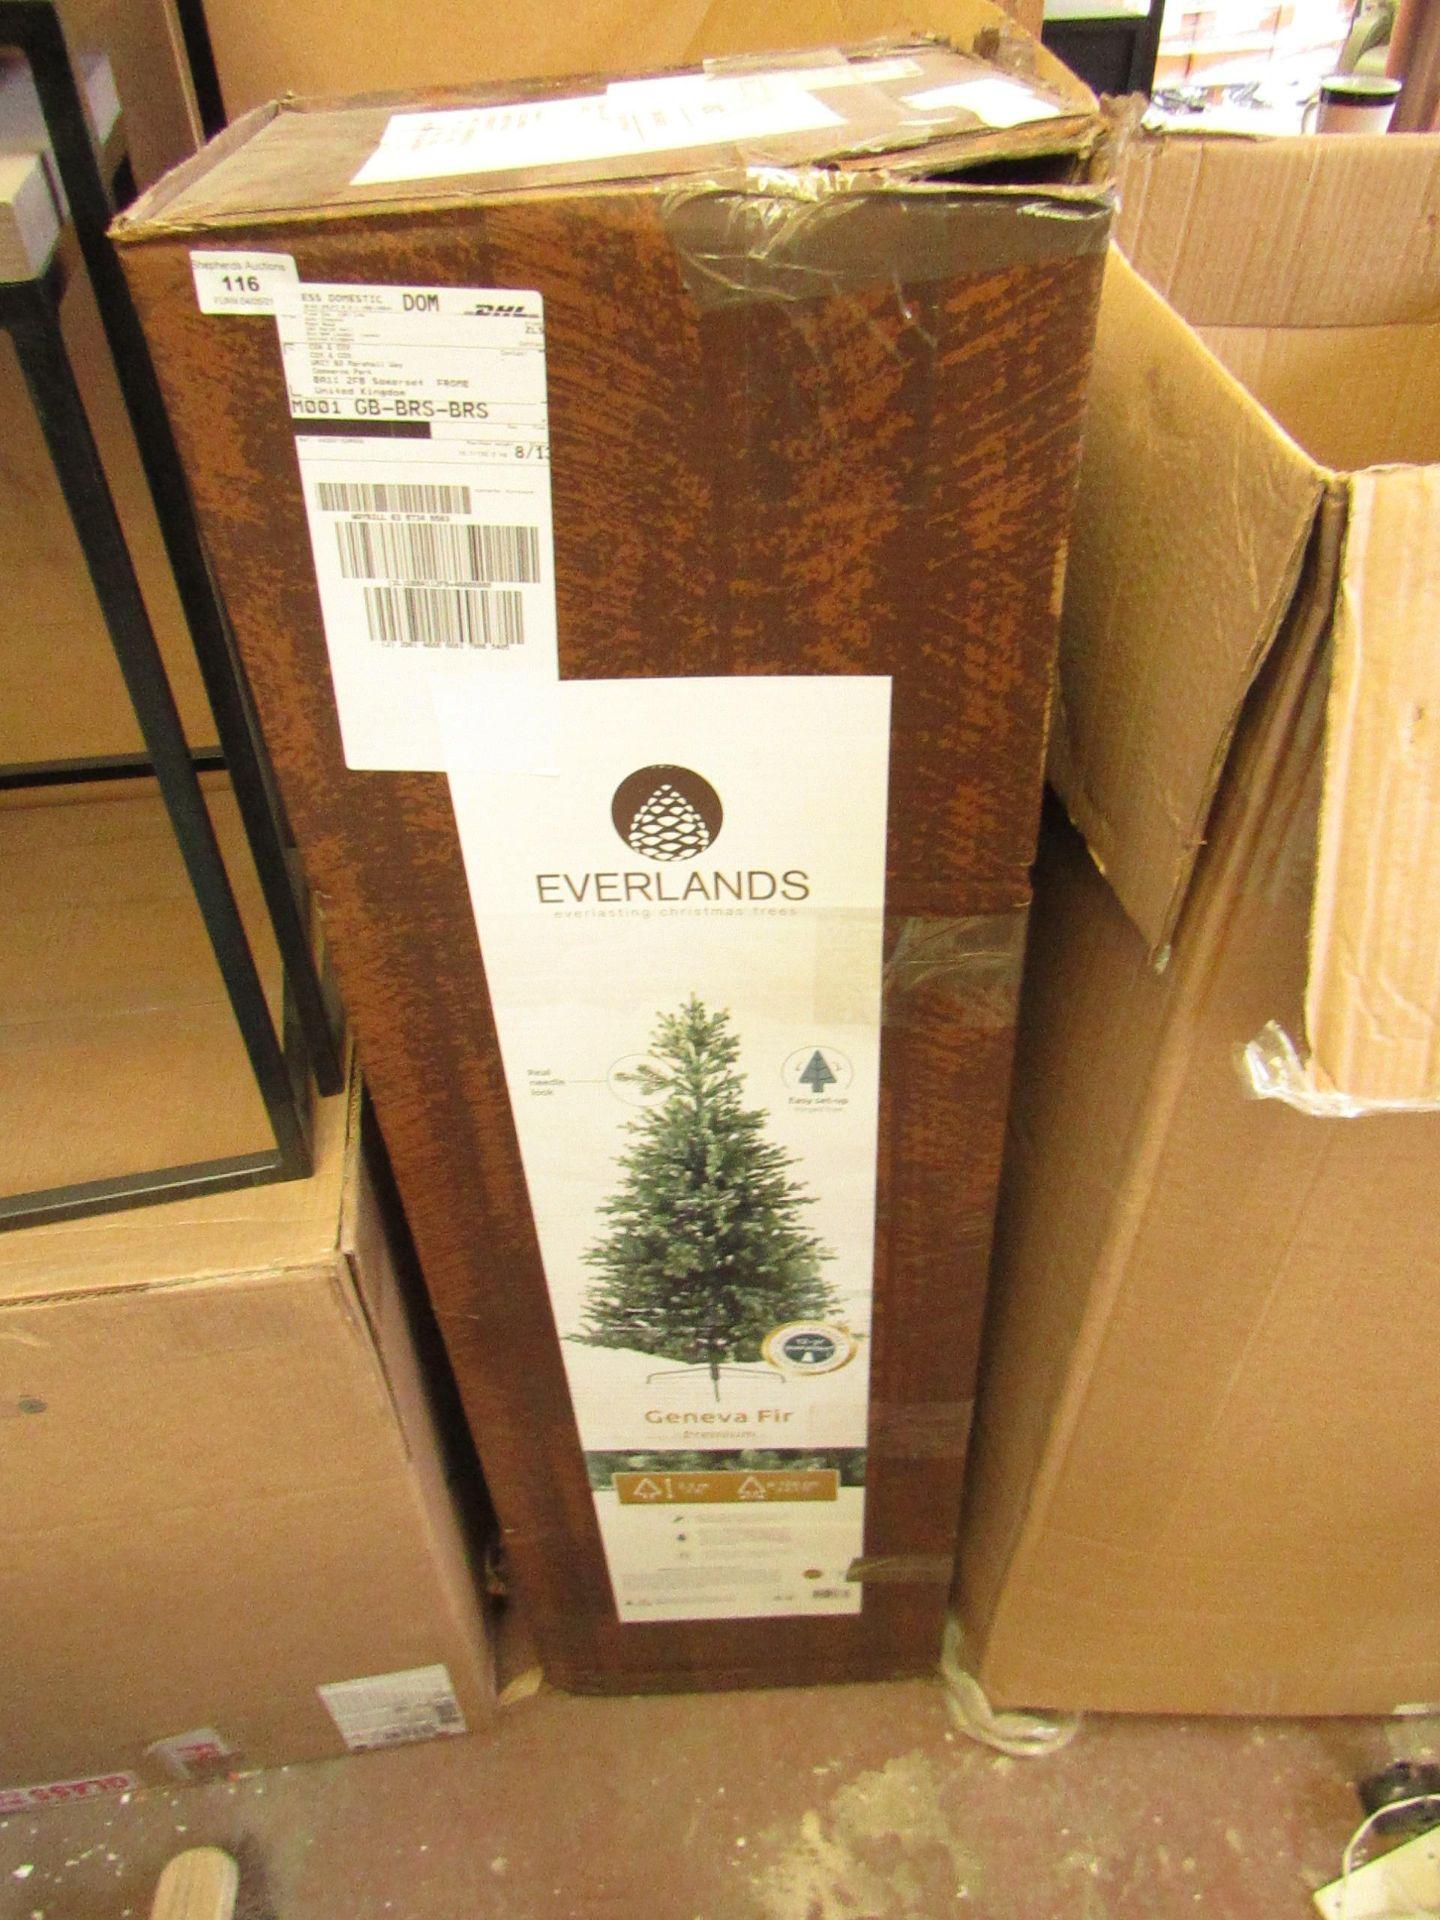   1X   COX & COX EVERLANDS GENEVA FIR PREMIUM TREE 7FT   UNCHECKED & BOXED   RRP -  